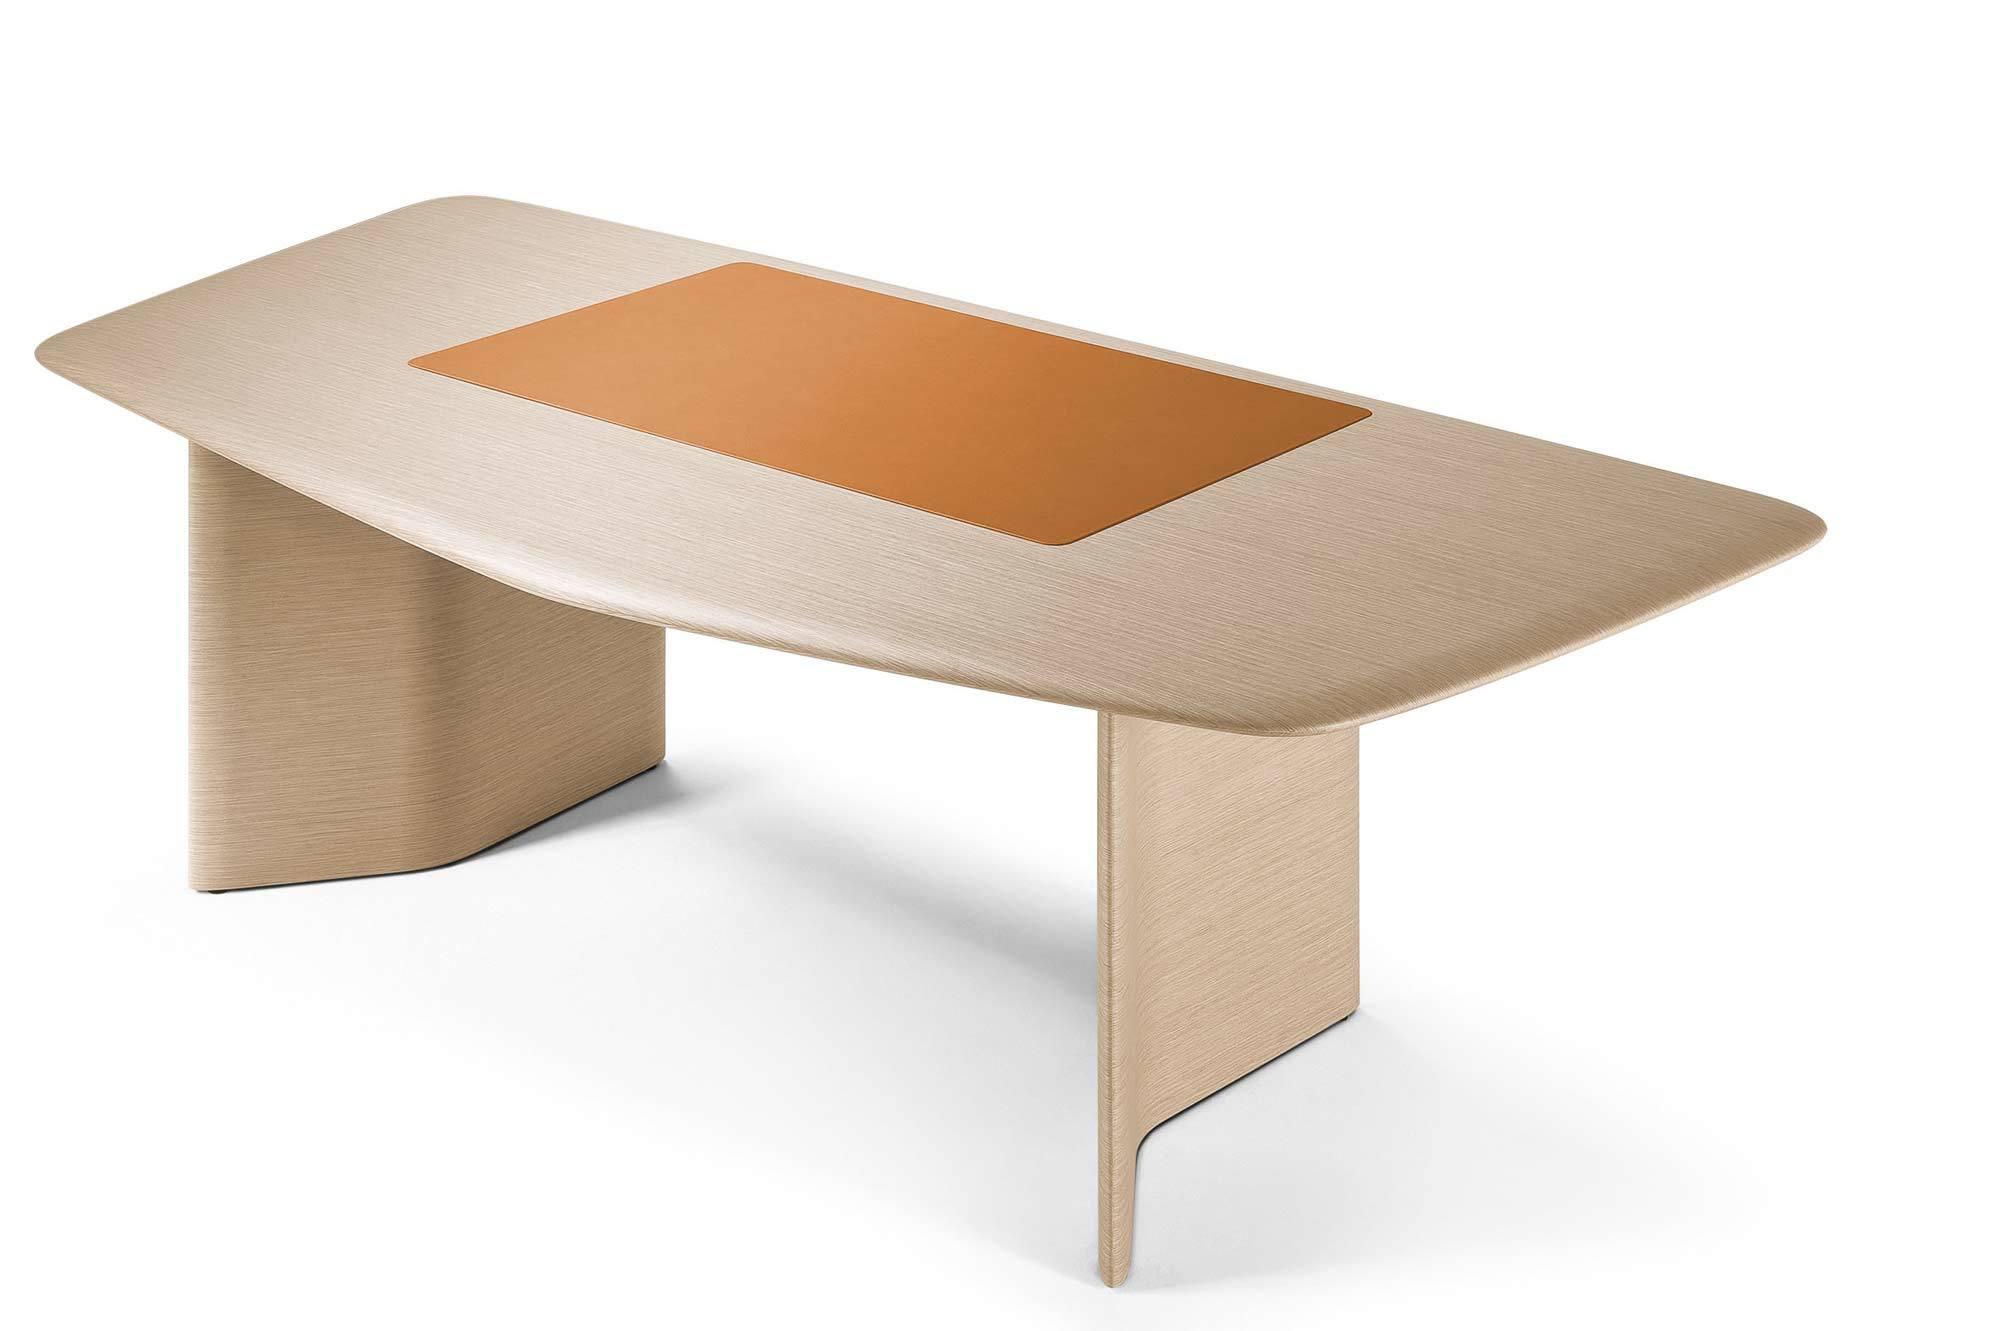 Kollektion Trust für Poltrona Frau, Design: Lievore Altherr, 2018